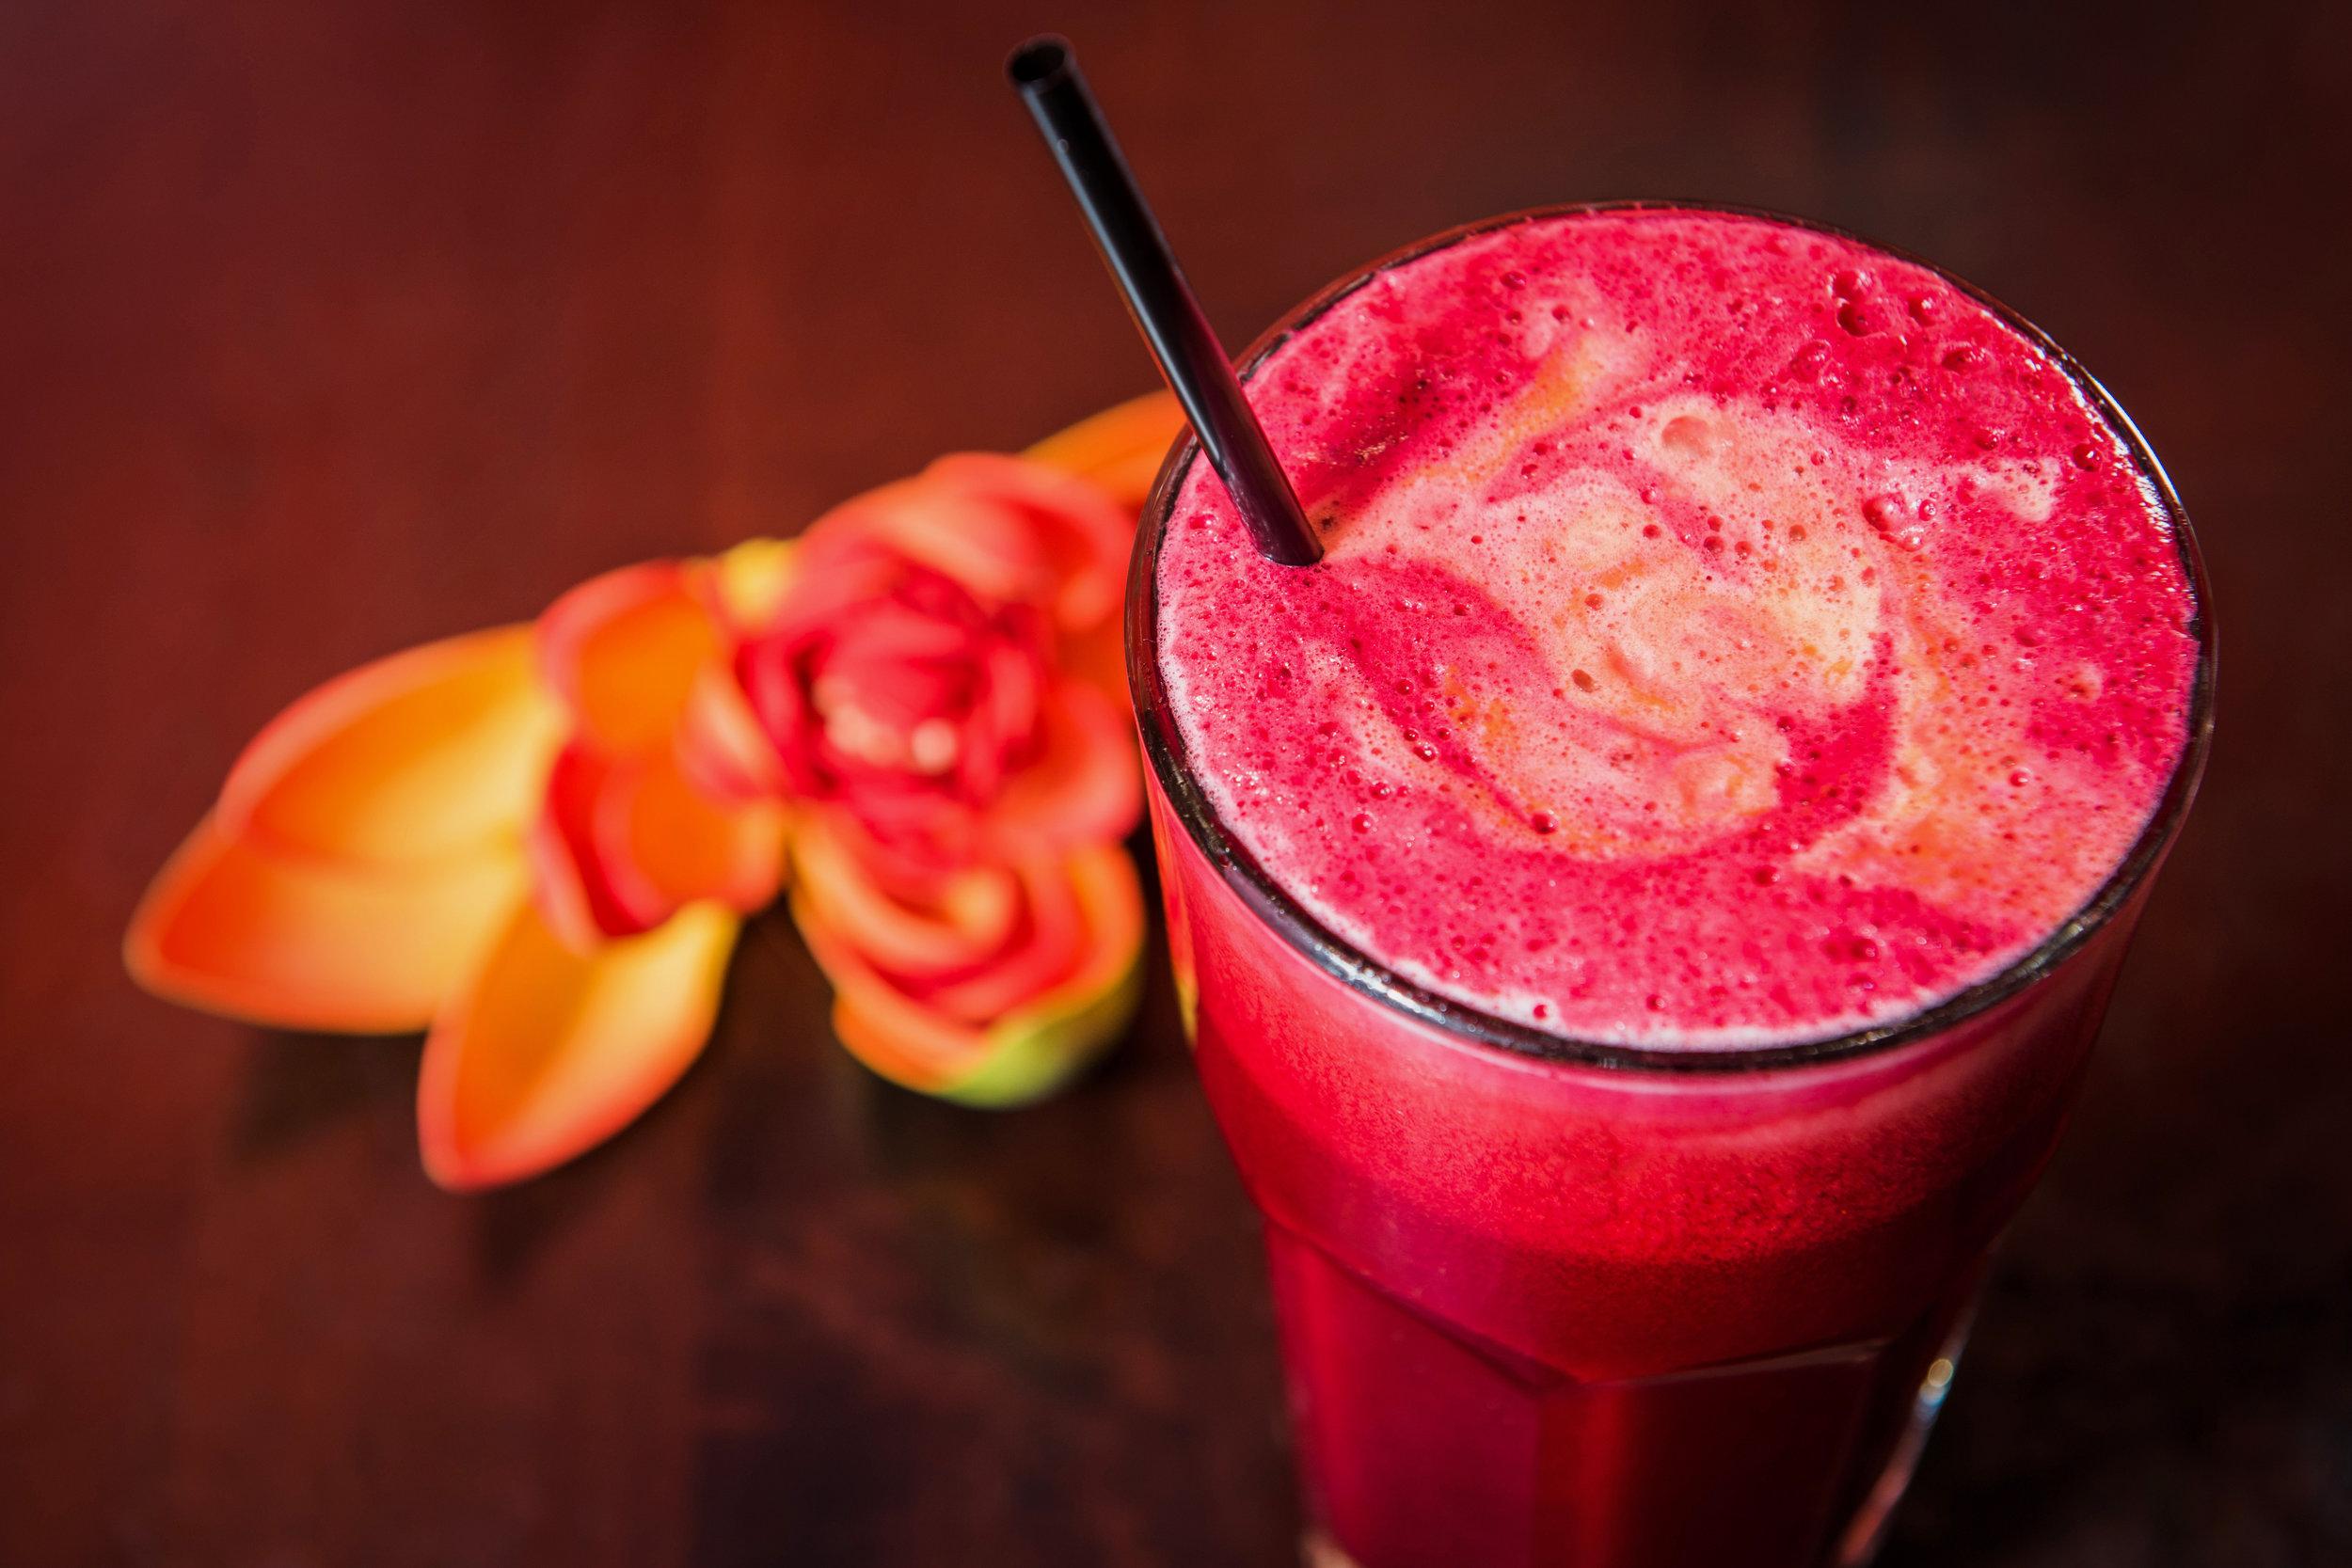 Lillipad Cafe Juice_5357.JPG